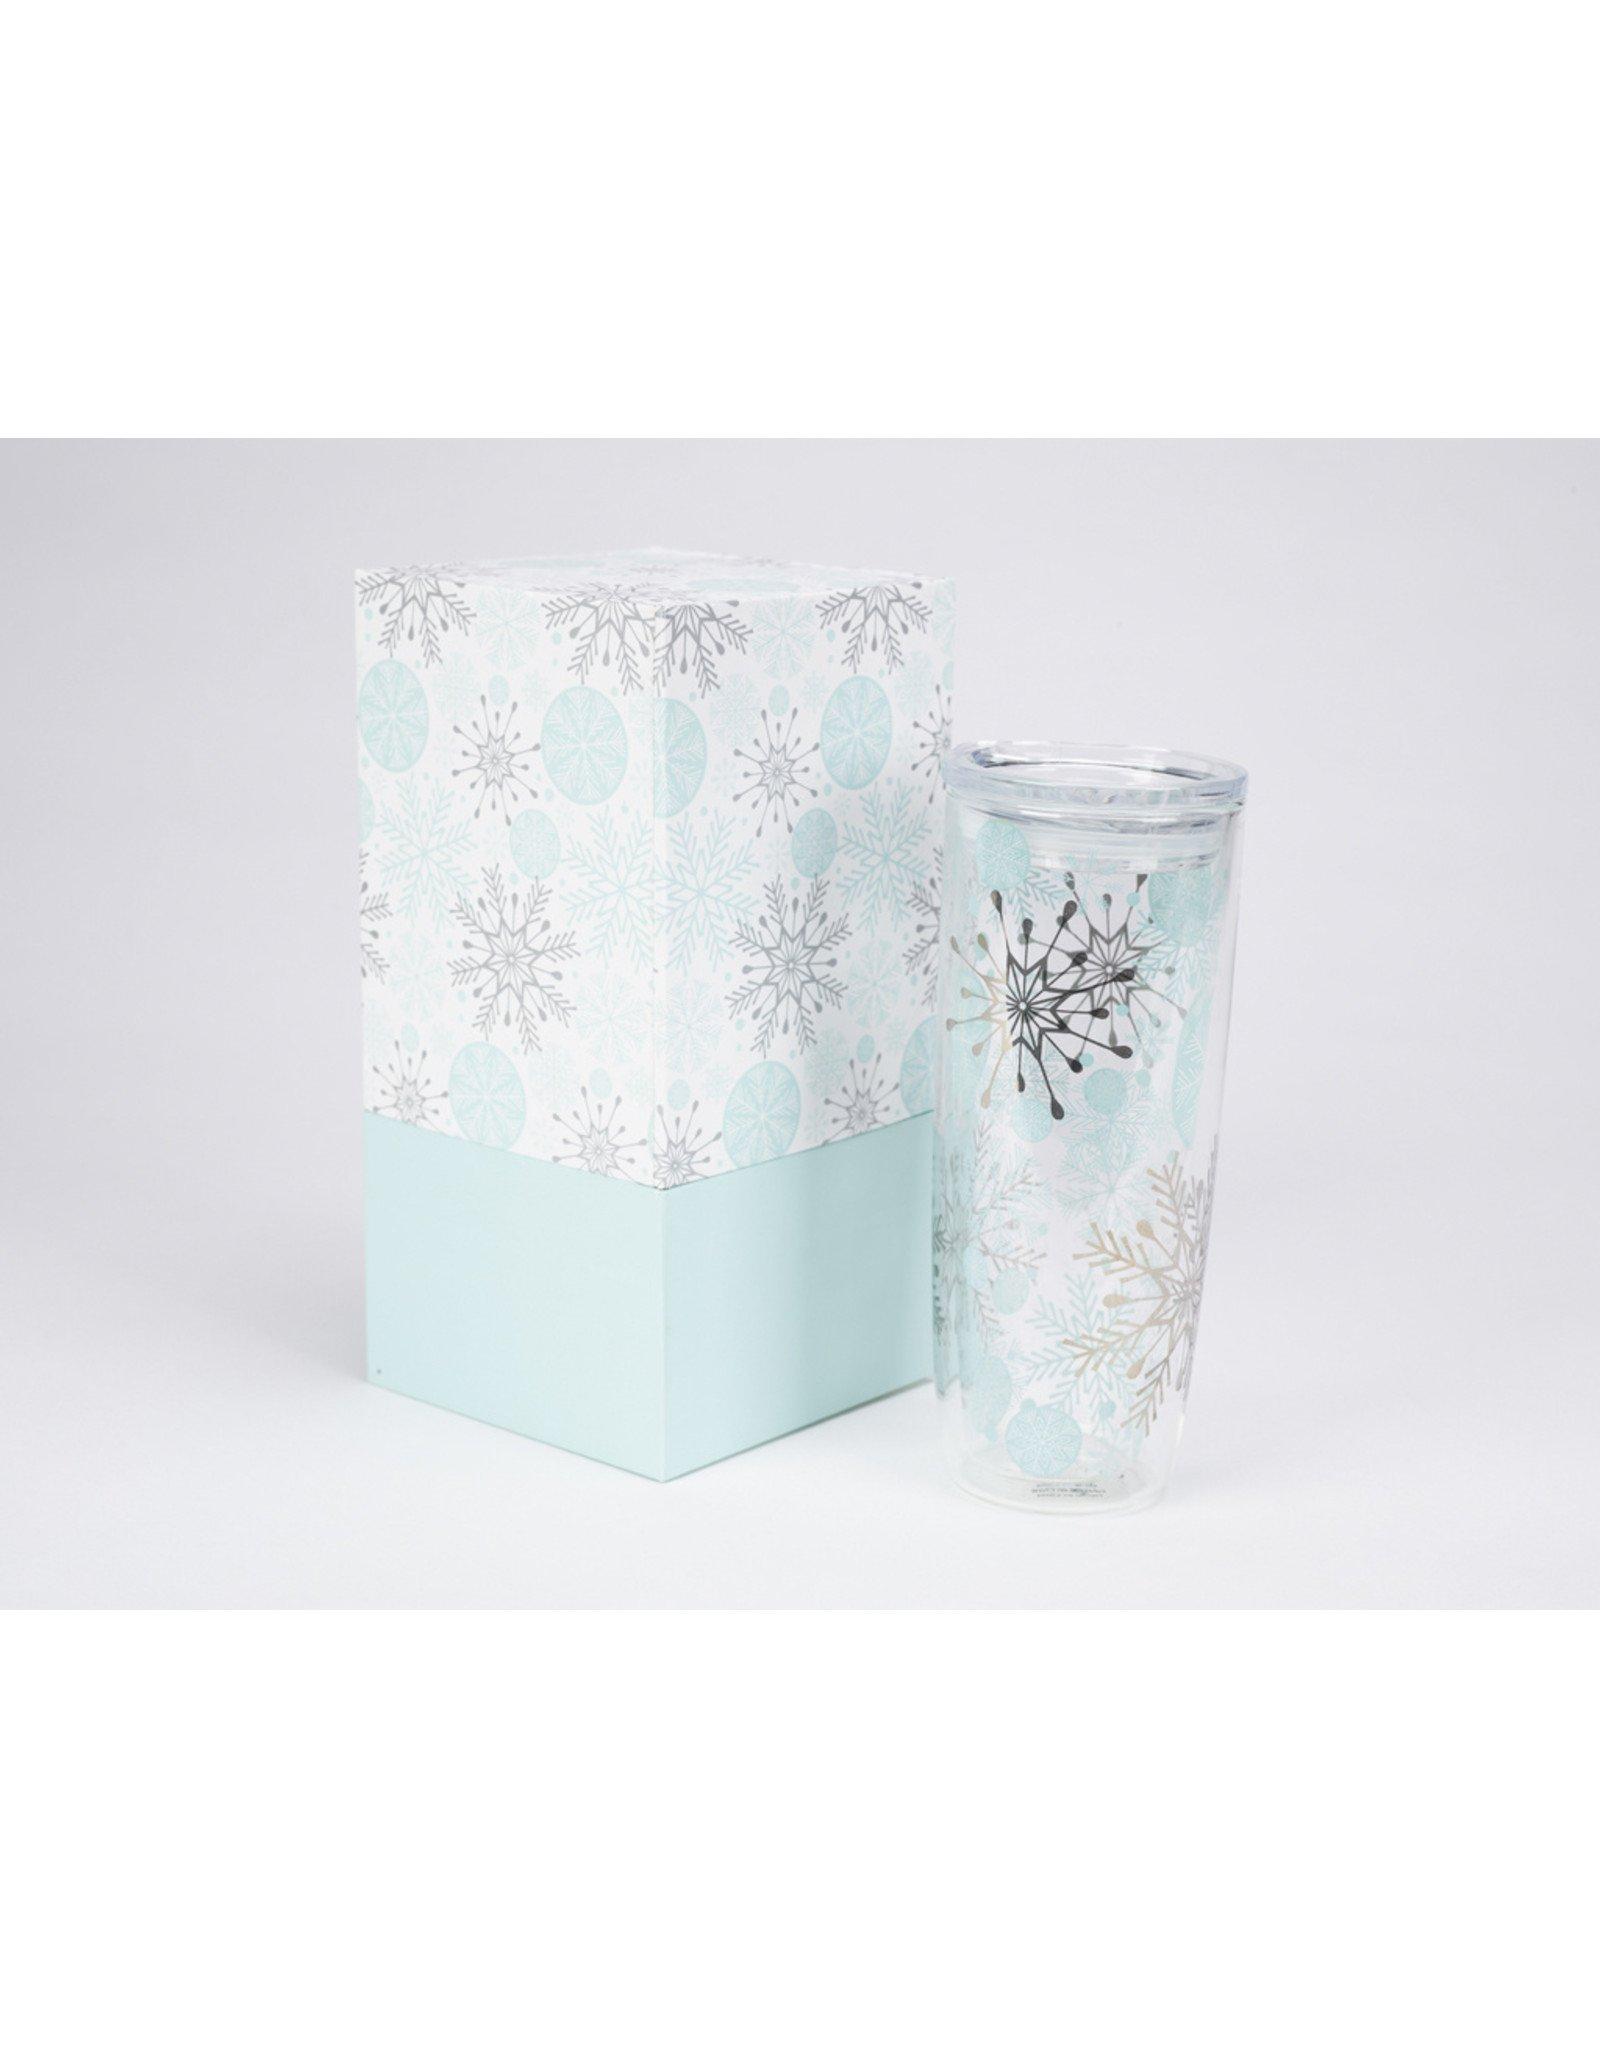 Boxed Double Wall Glass Tumbler Snowflakes